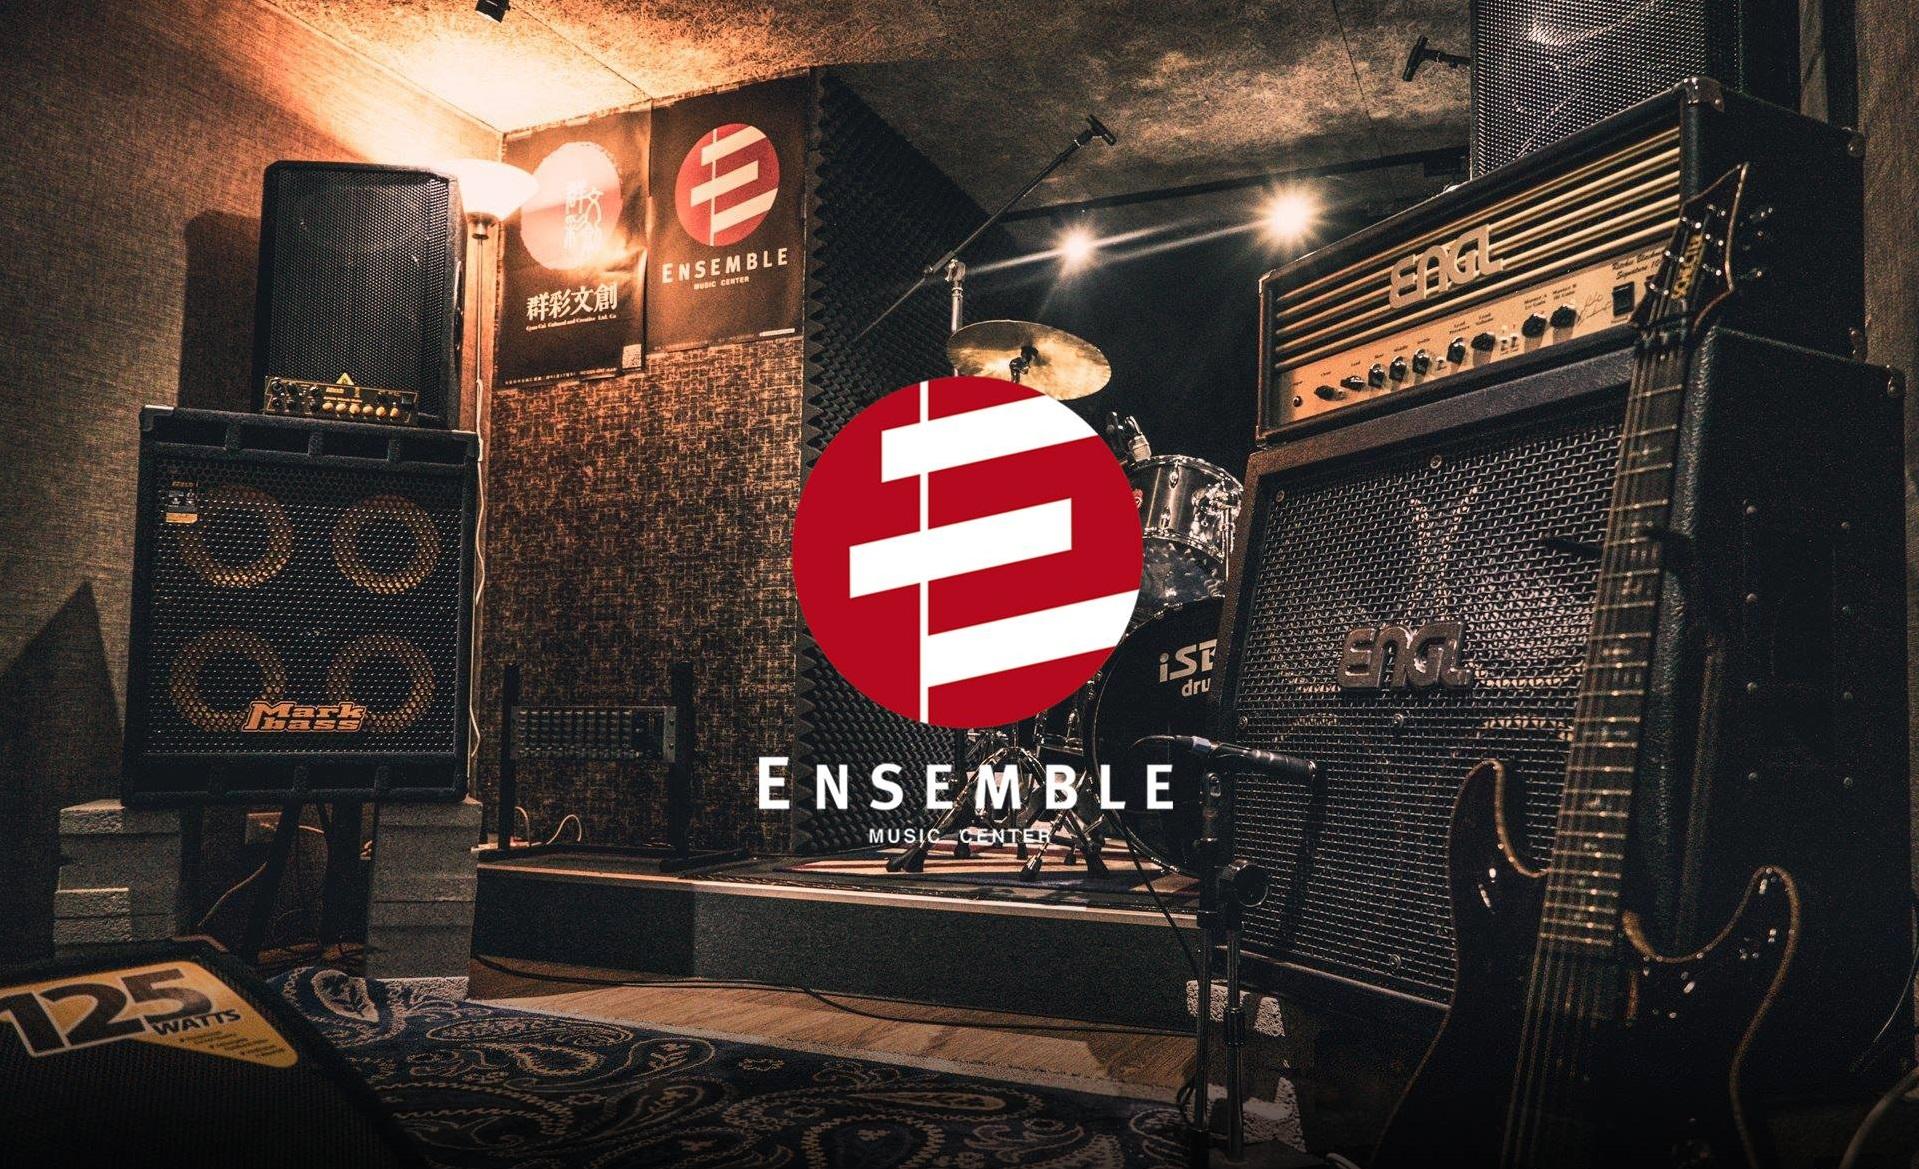 Ensemble Music Center 揚聲堡音樂中 新年滿額折扣 最高現折2千